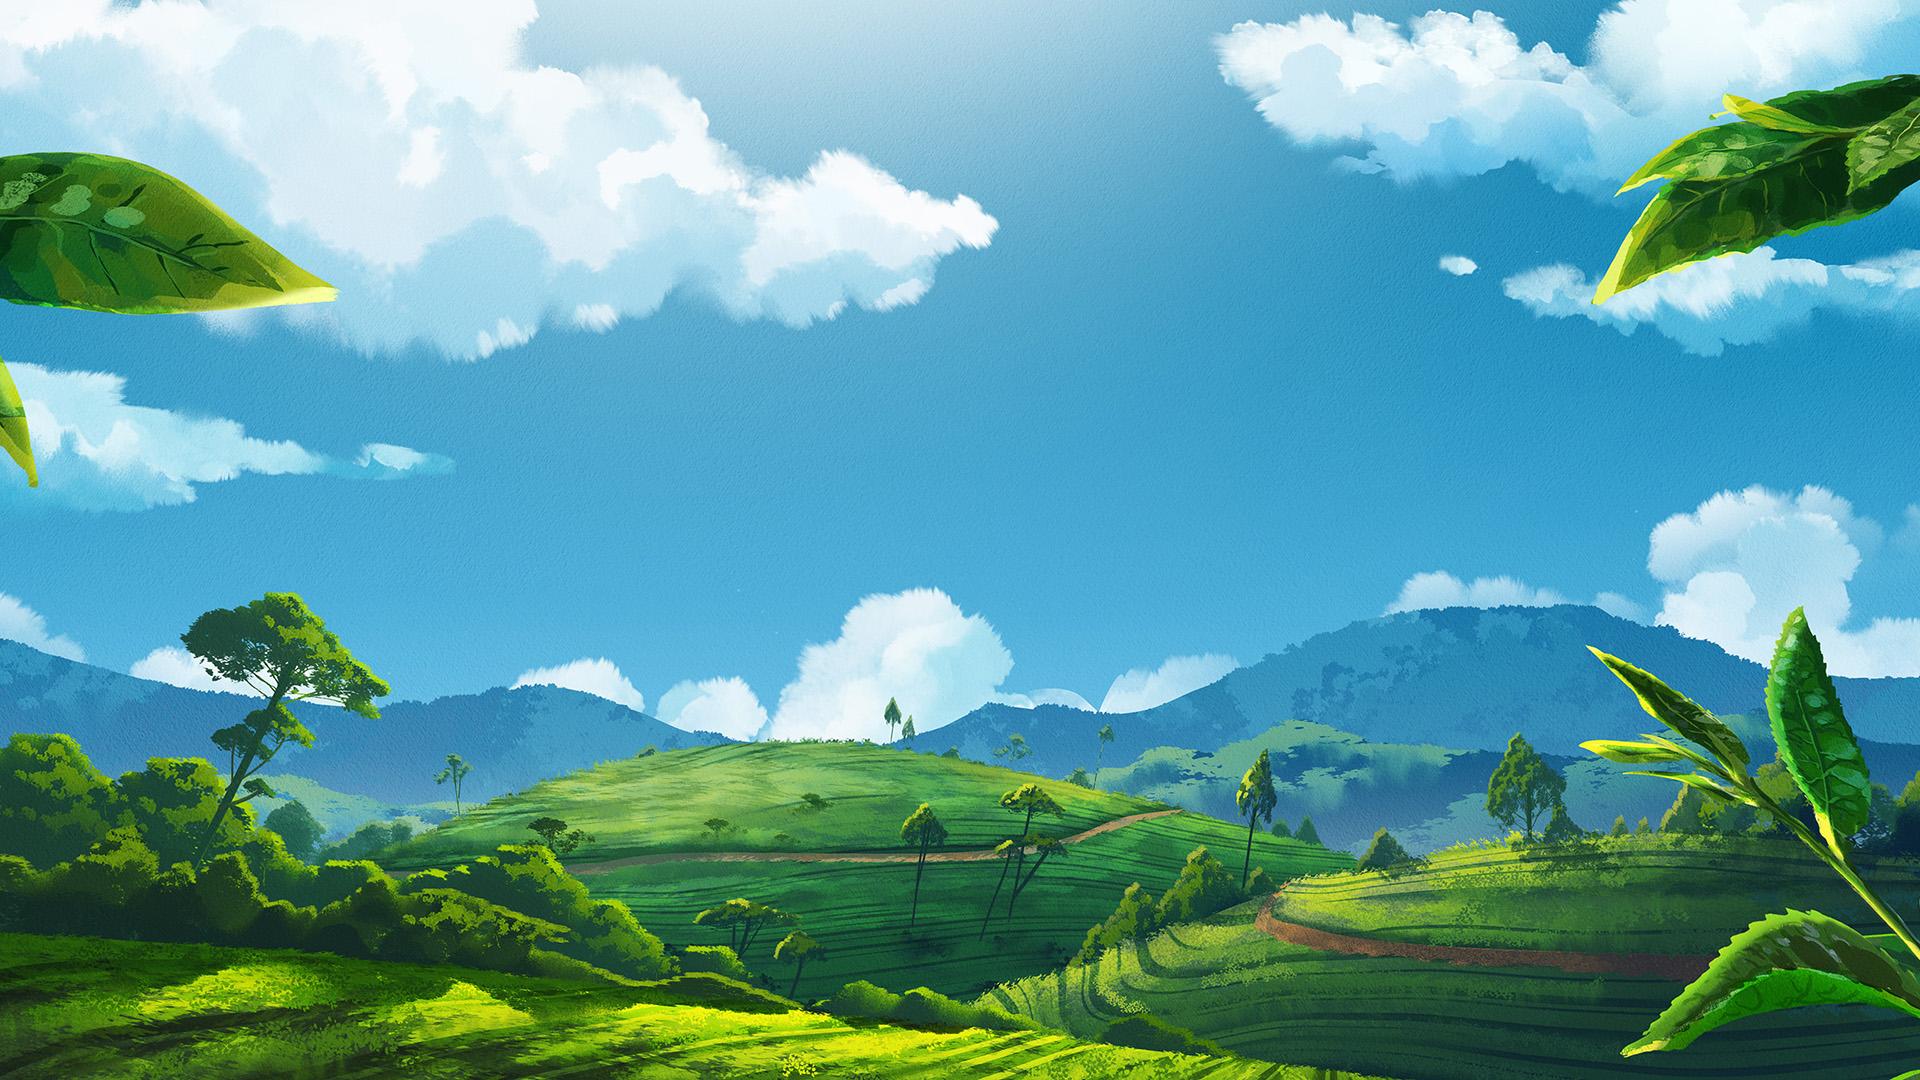 Gogo Tea: Landscape